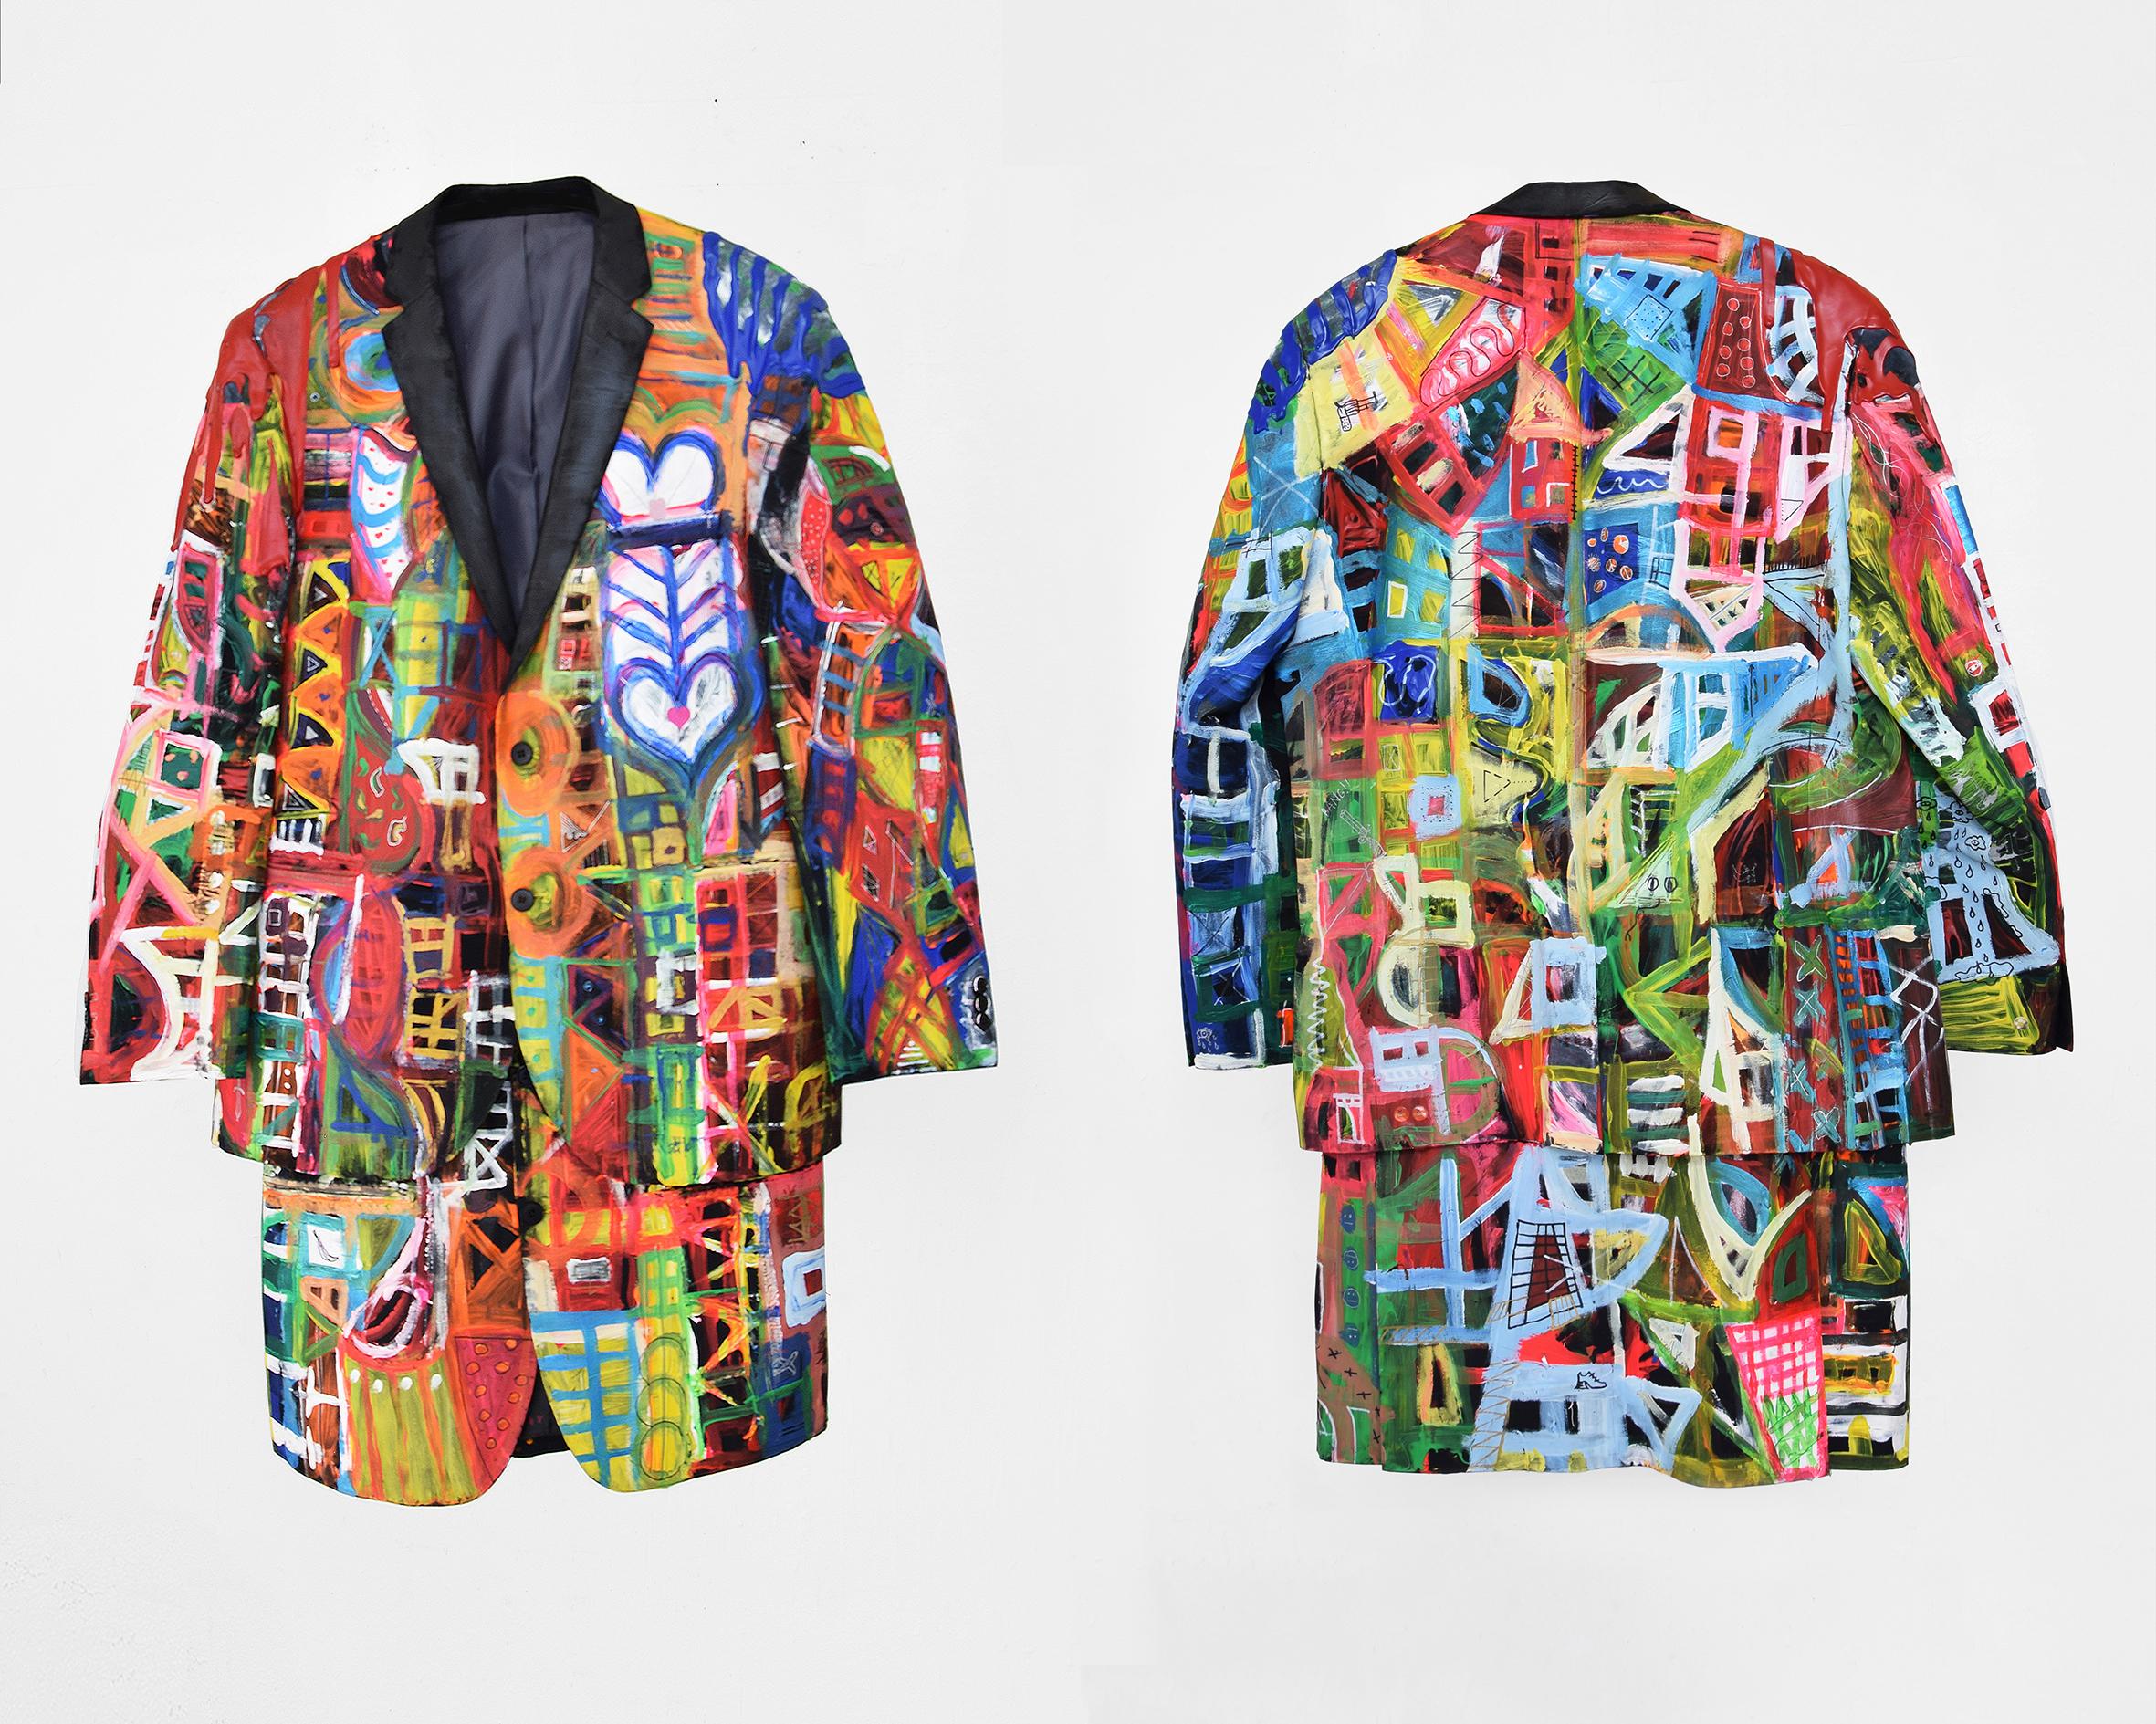 Vestito di Luca cuore Luca Bosani 2017 Painthing